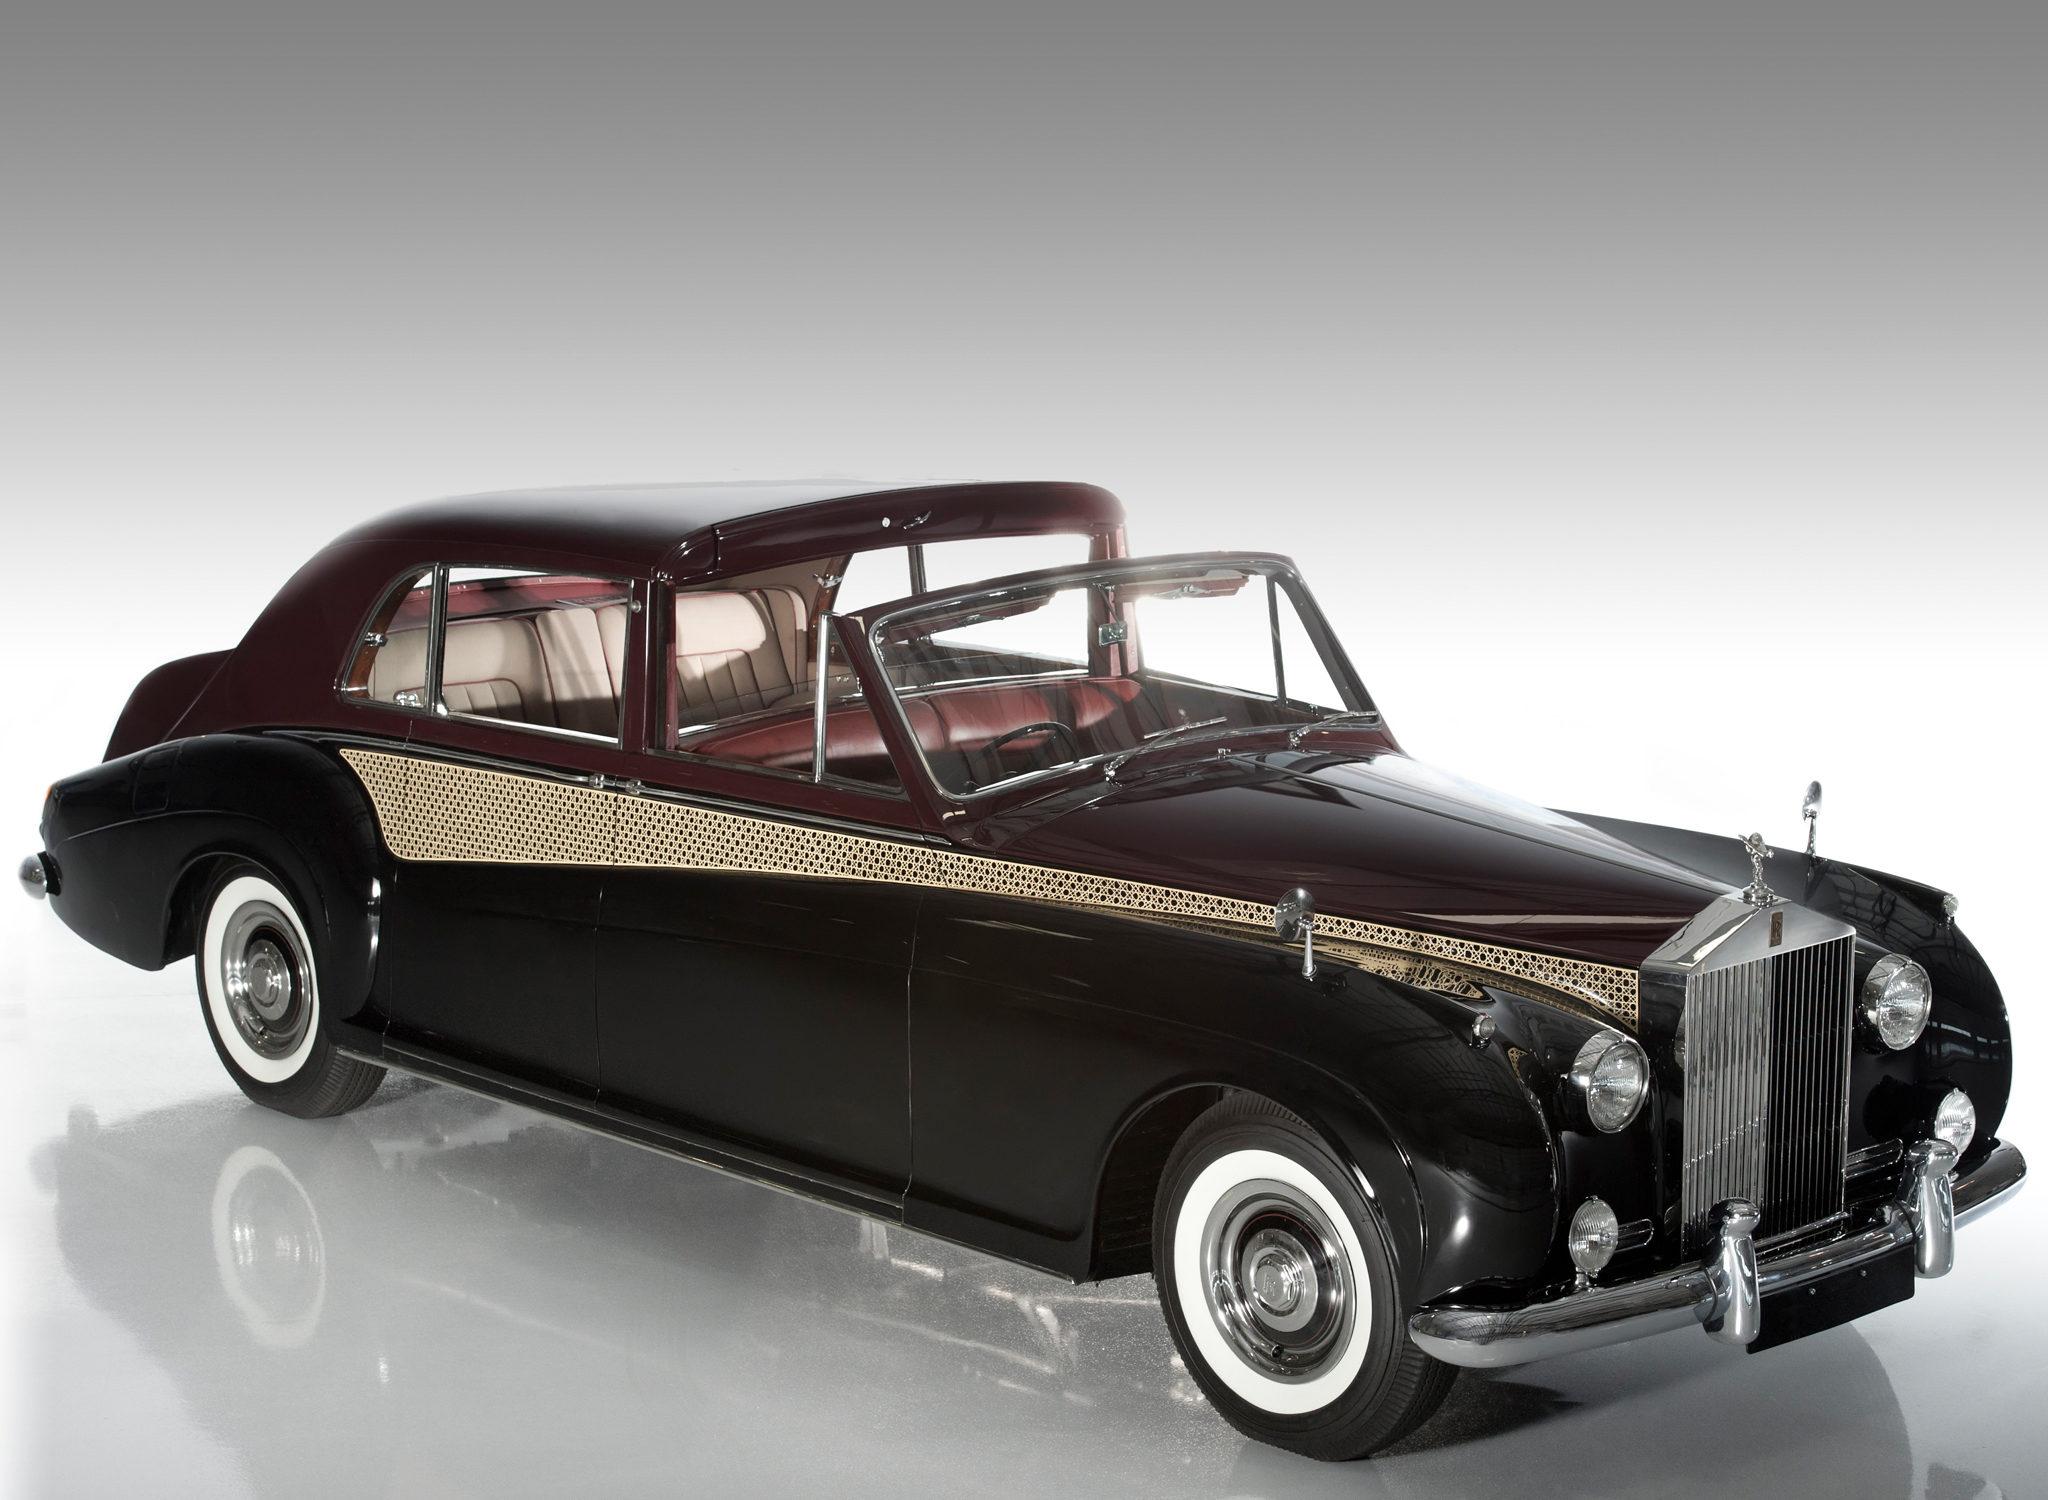 1960 Rolls-Royce Phantom V Sedanca Deville